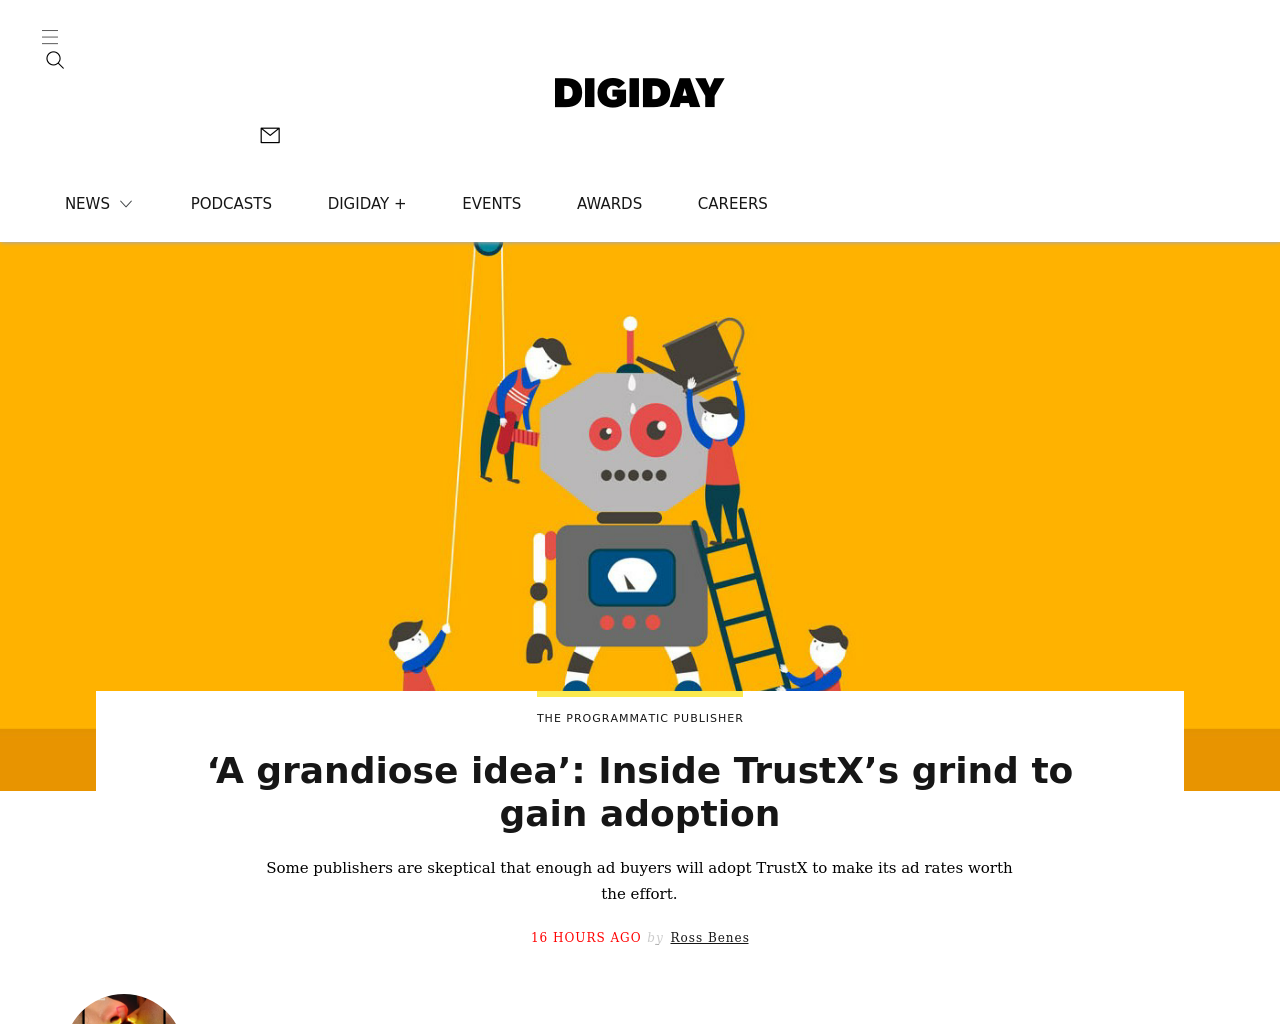 Digiday-Advertising-Reviews-Pricing